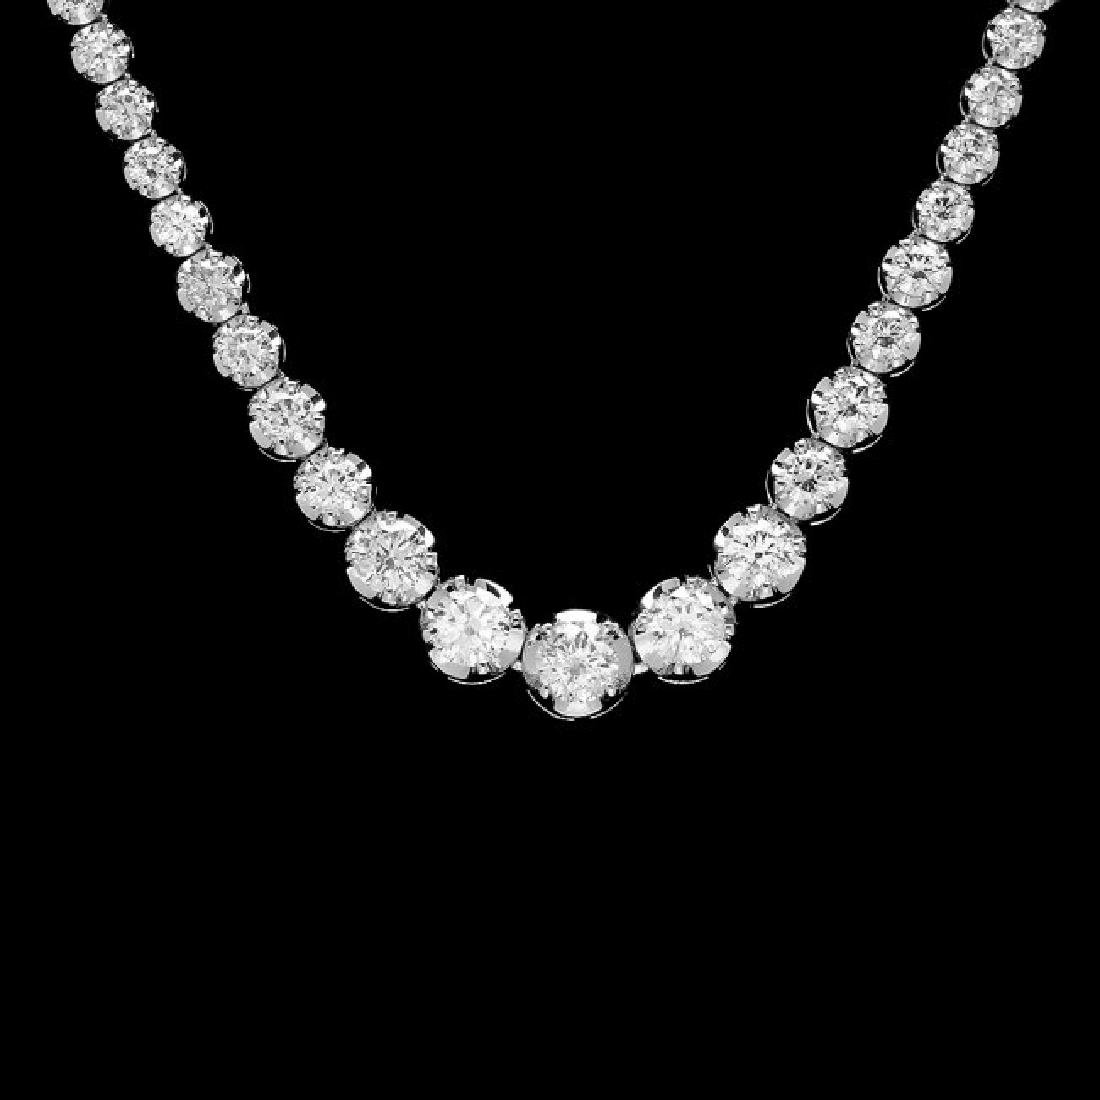 18k White Gold 11.60ct Diamond Necklace